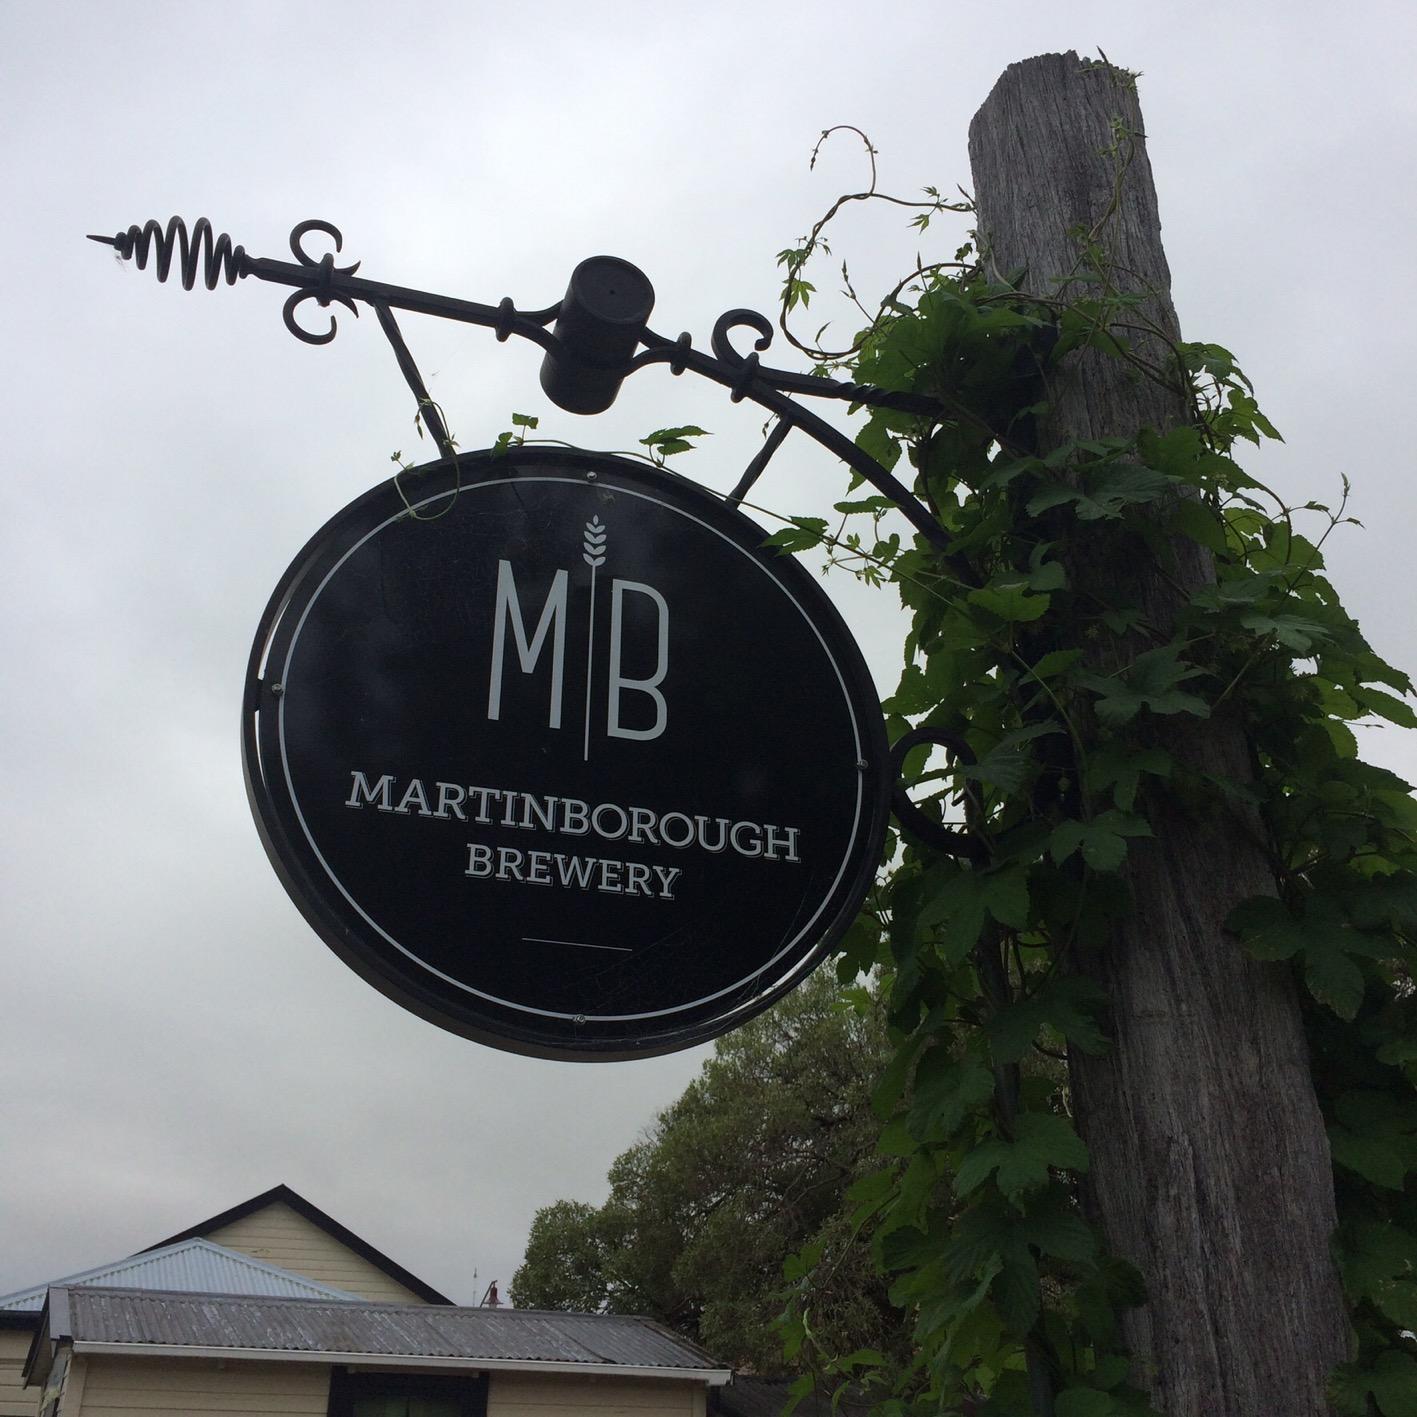 Martinborough Brewery, New Zealand